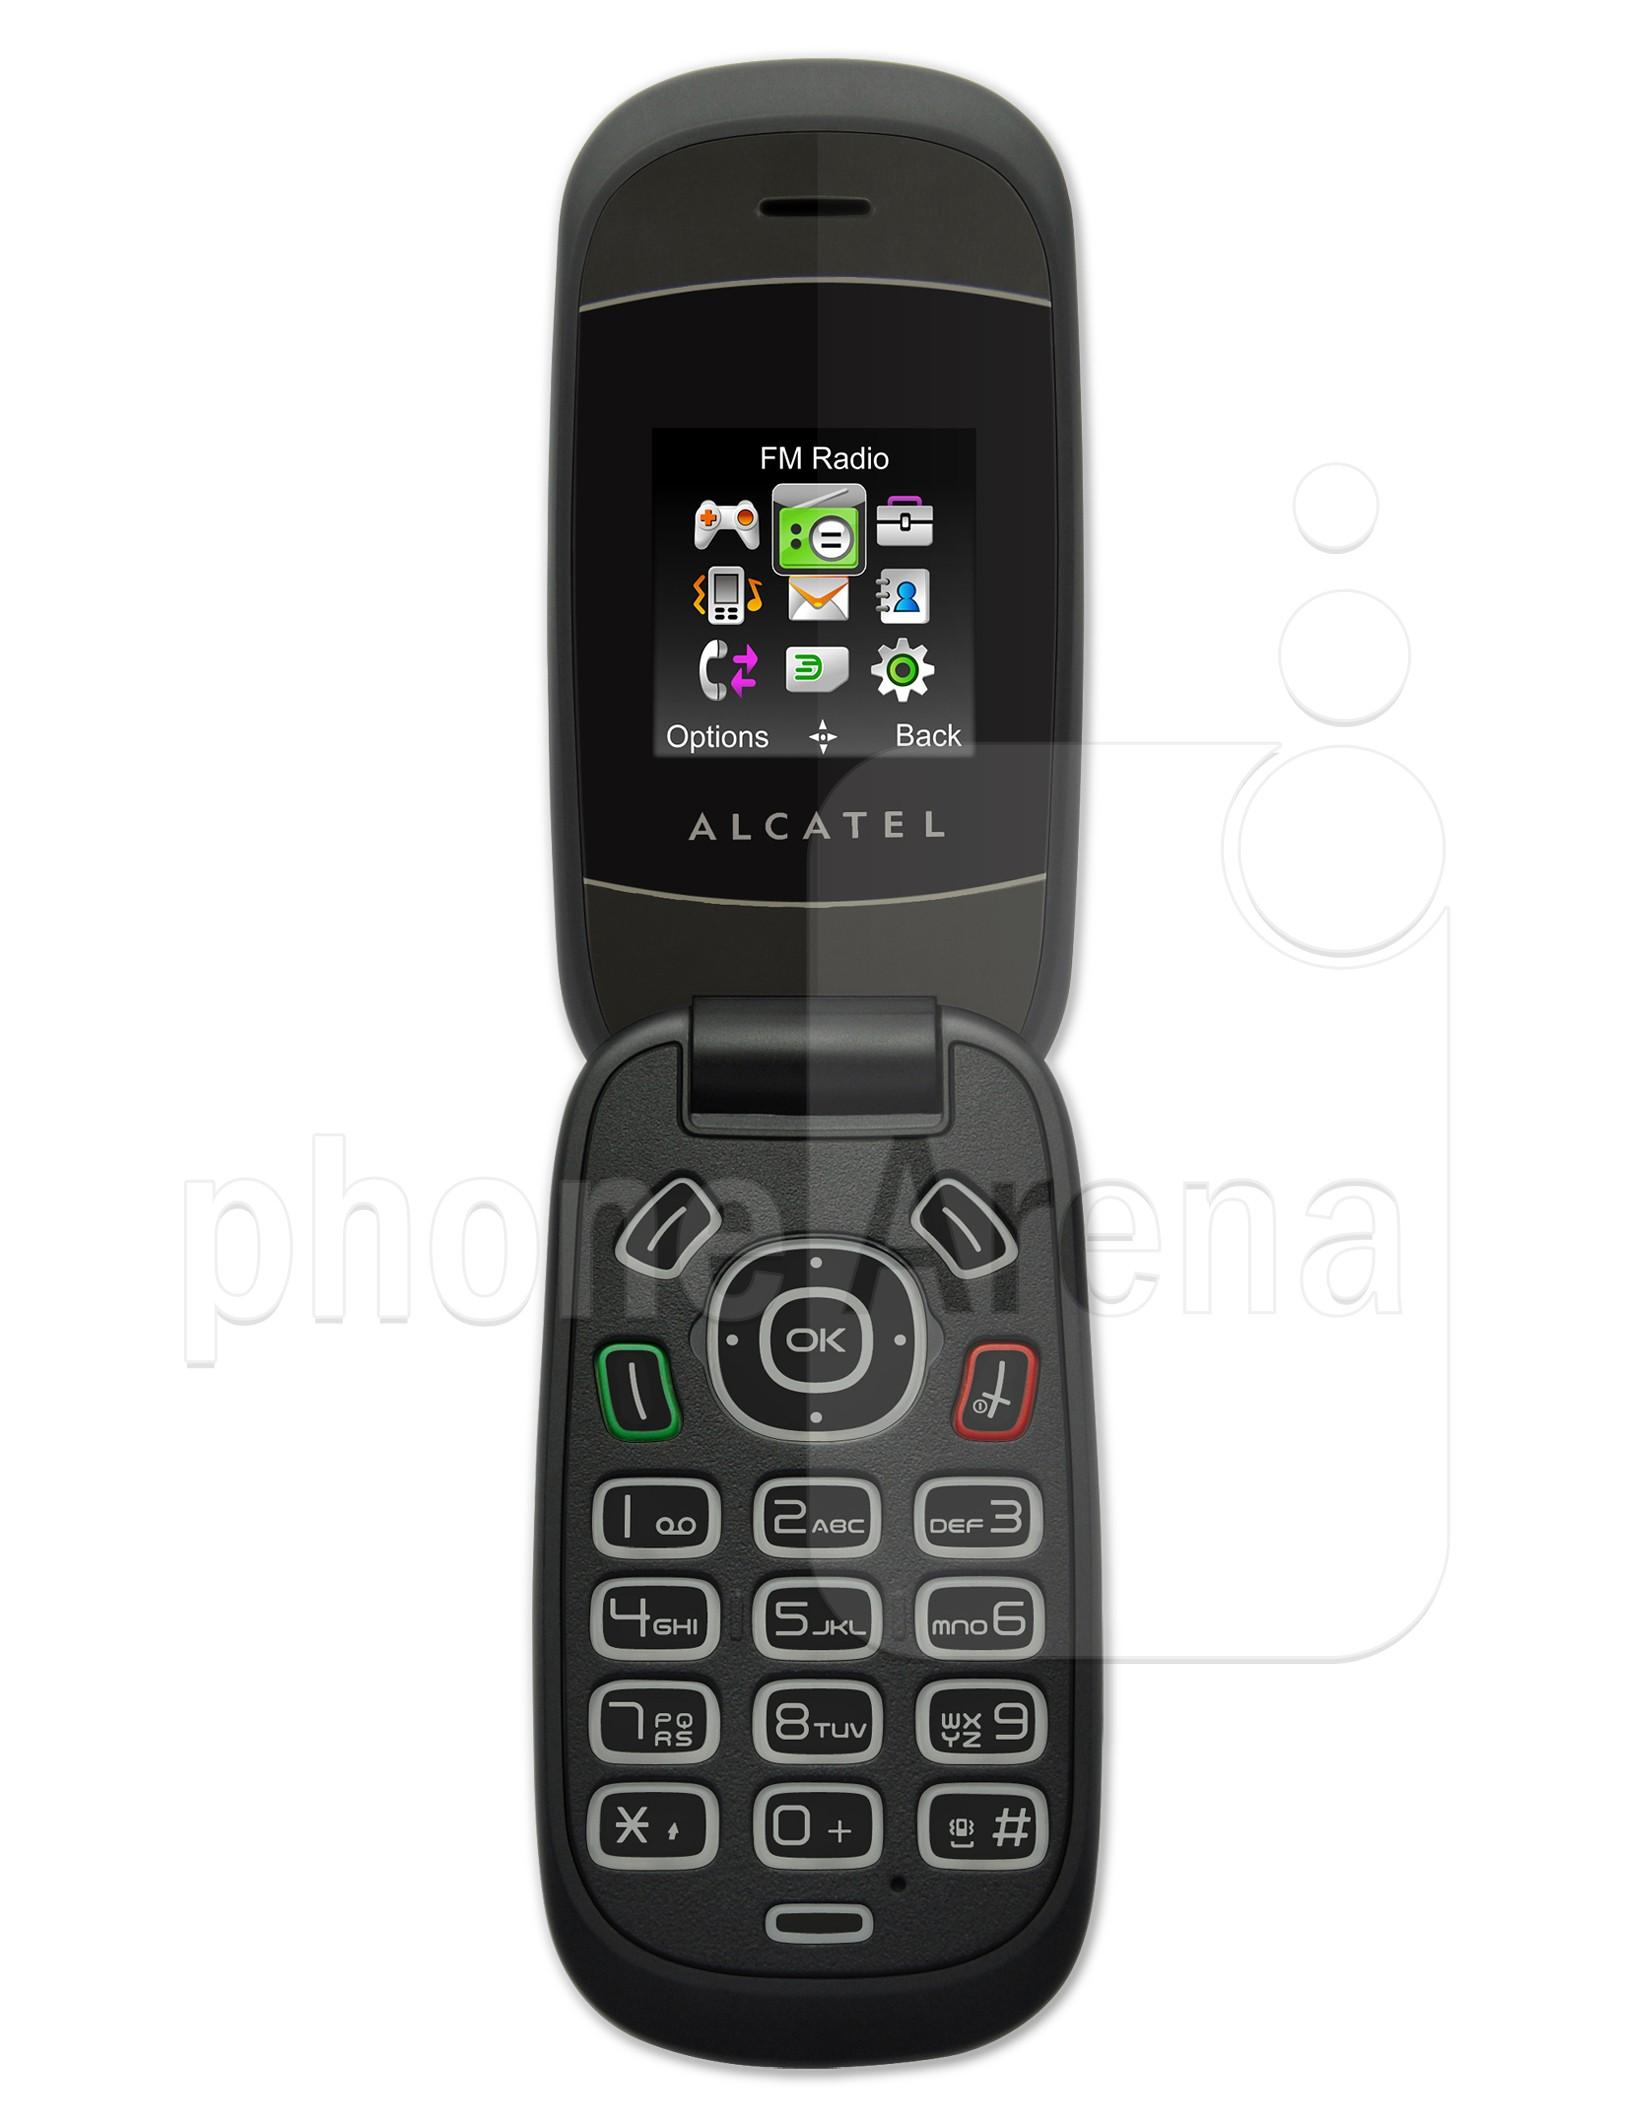 Alcatel OT 223A specs